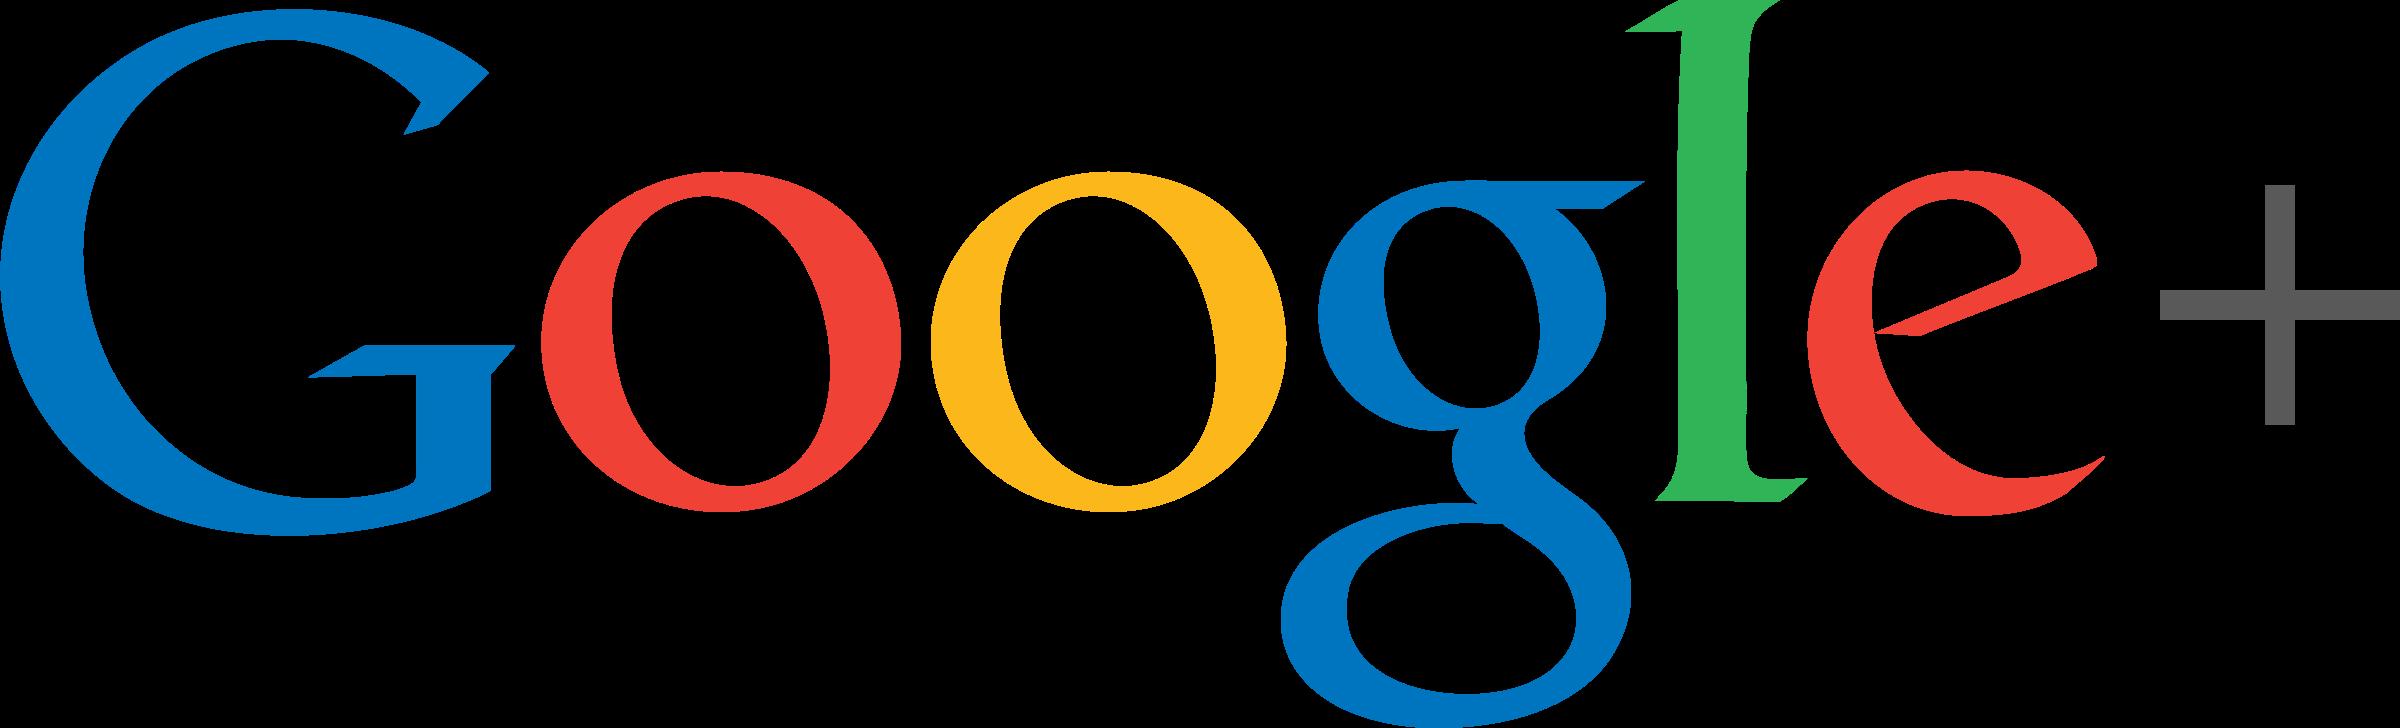 2400x728 Google Plus Logo Png Transparent Amp Svg Vector